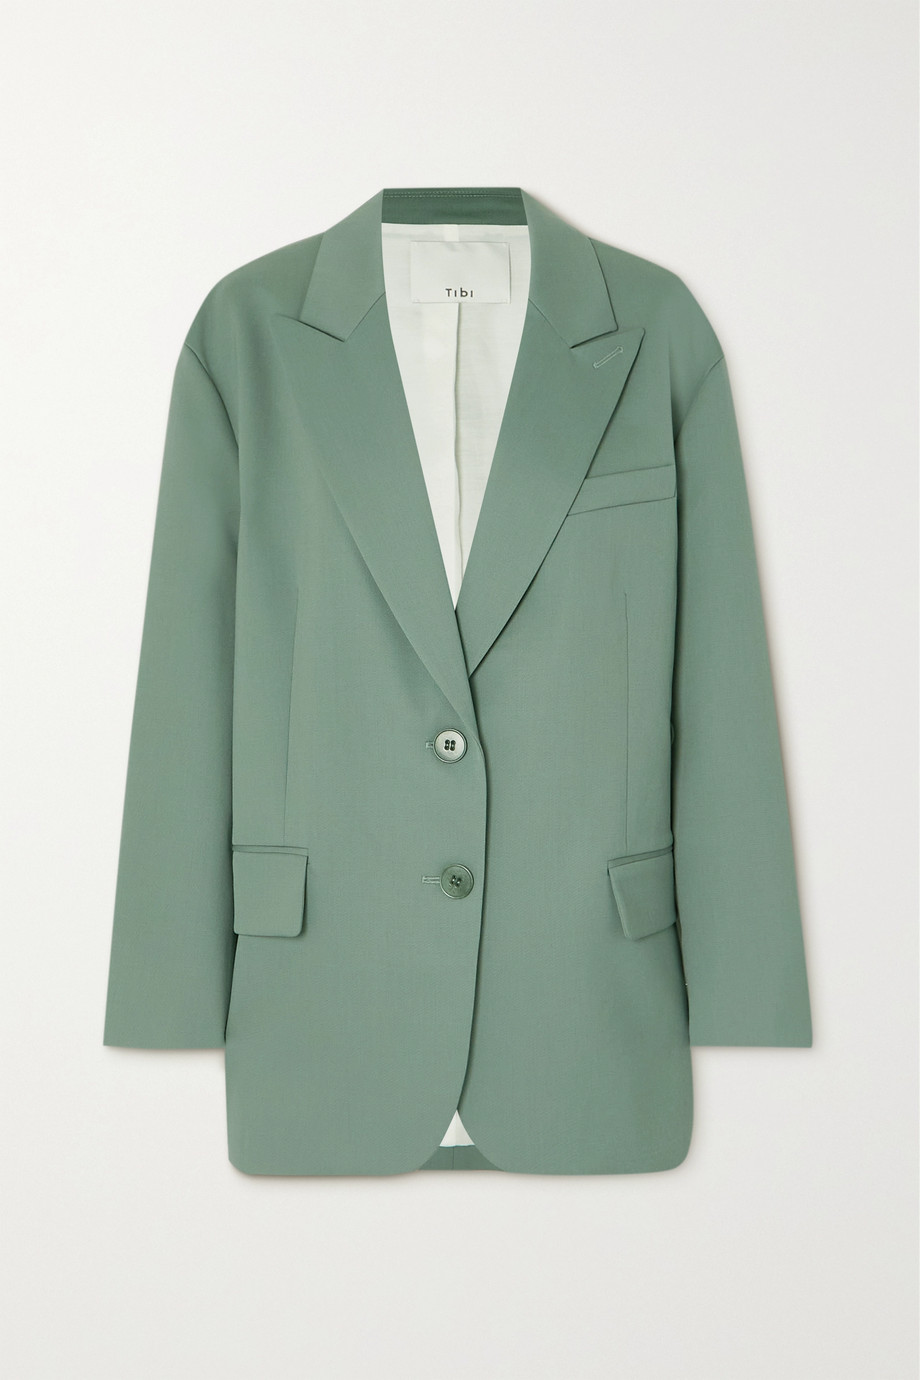 Tibi Cassius wool-blend blazer